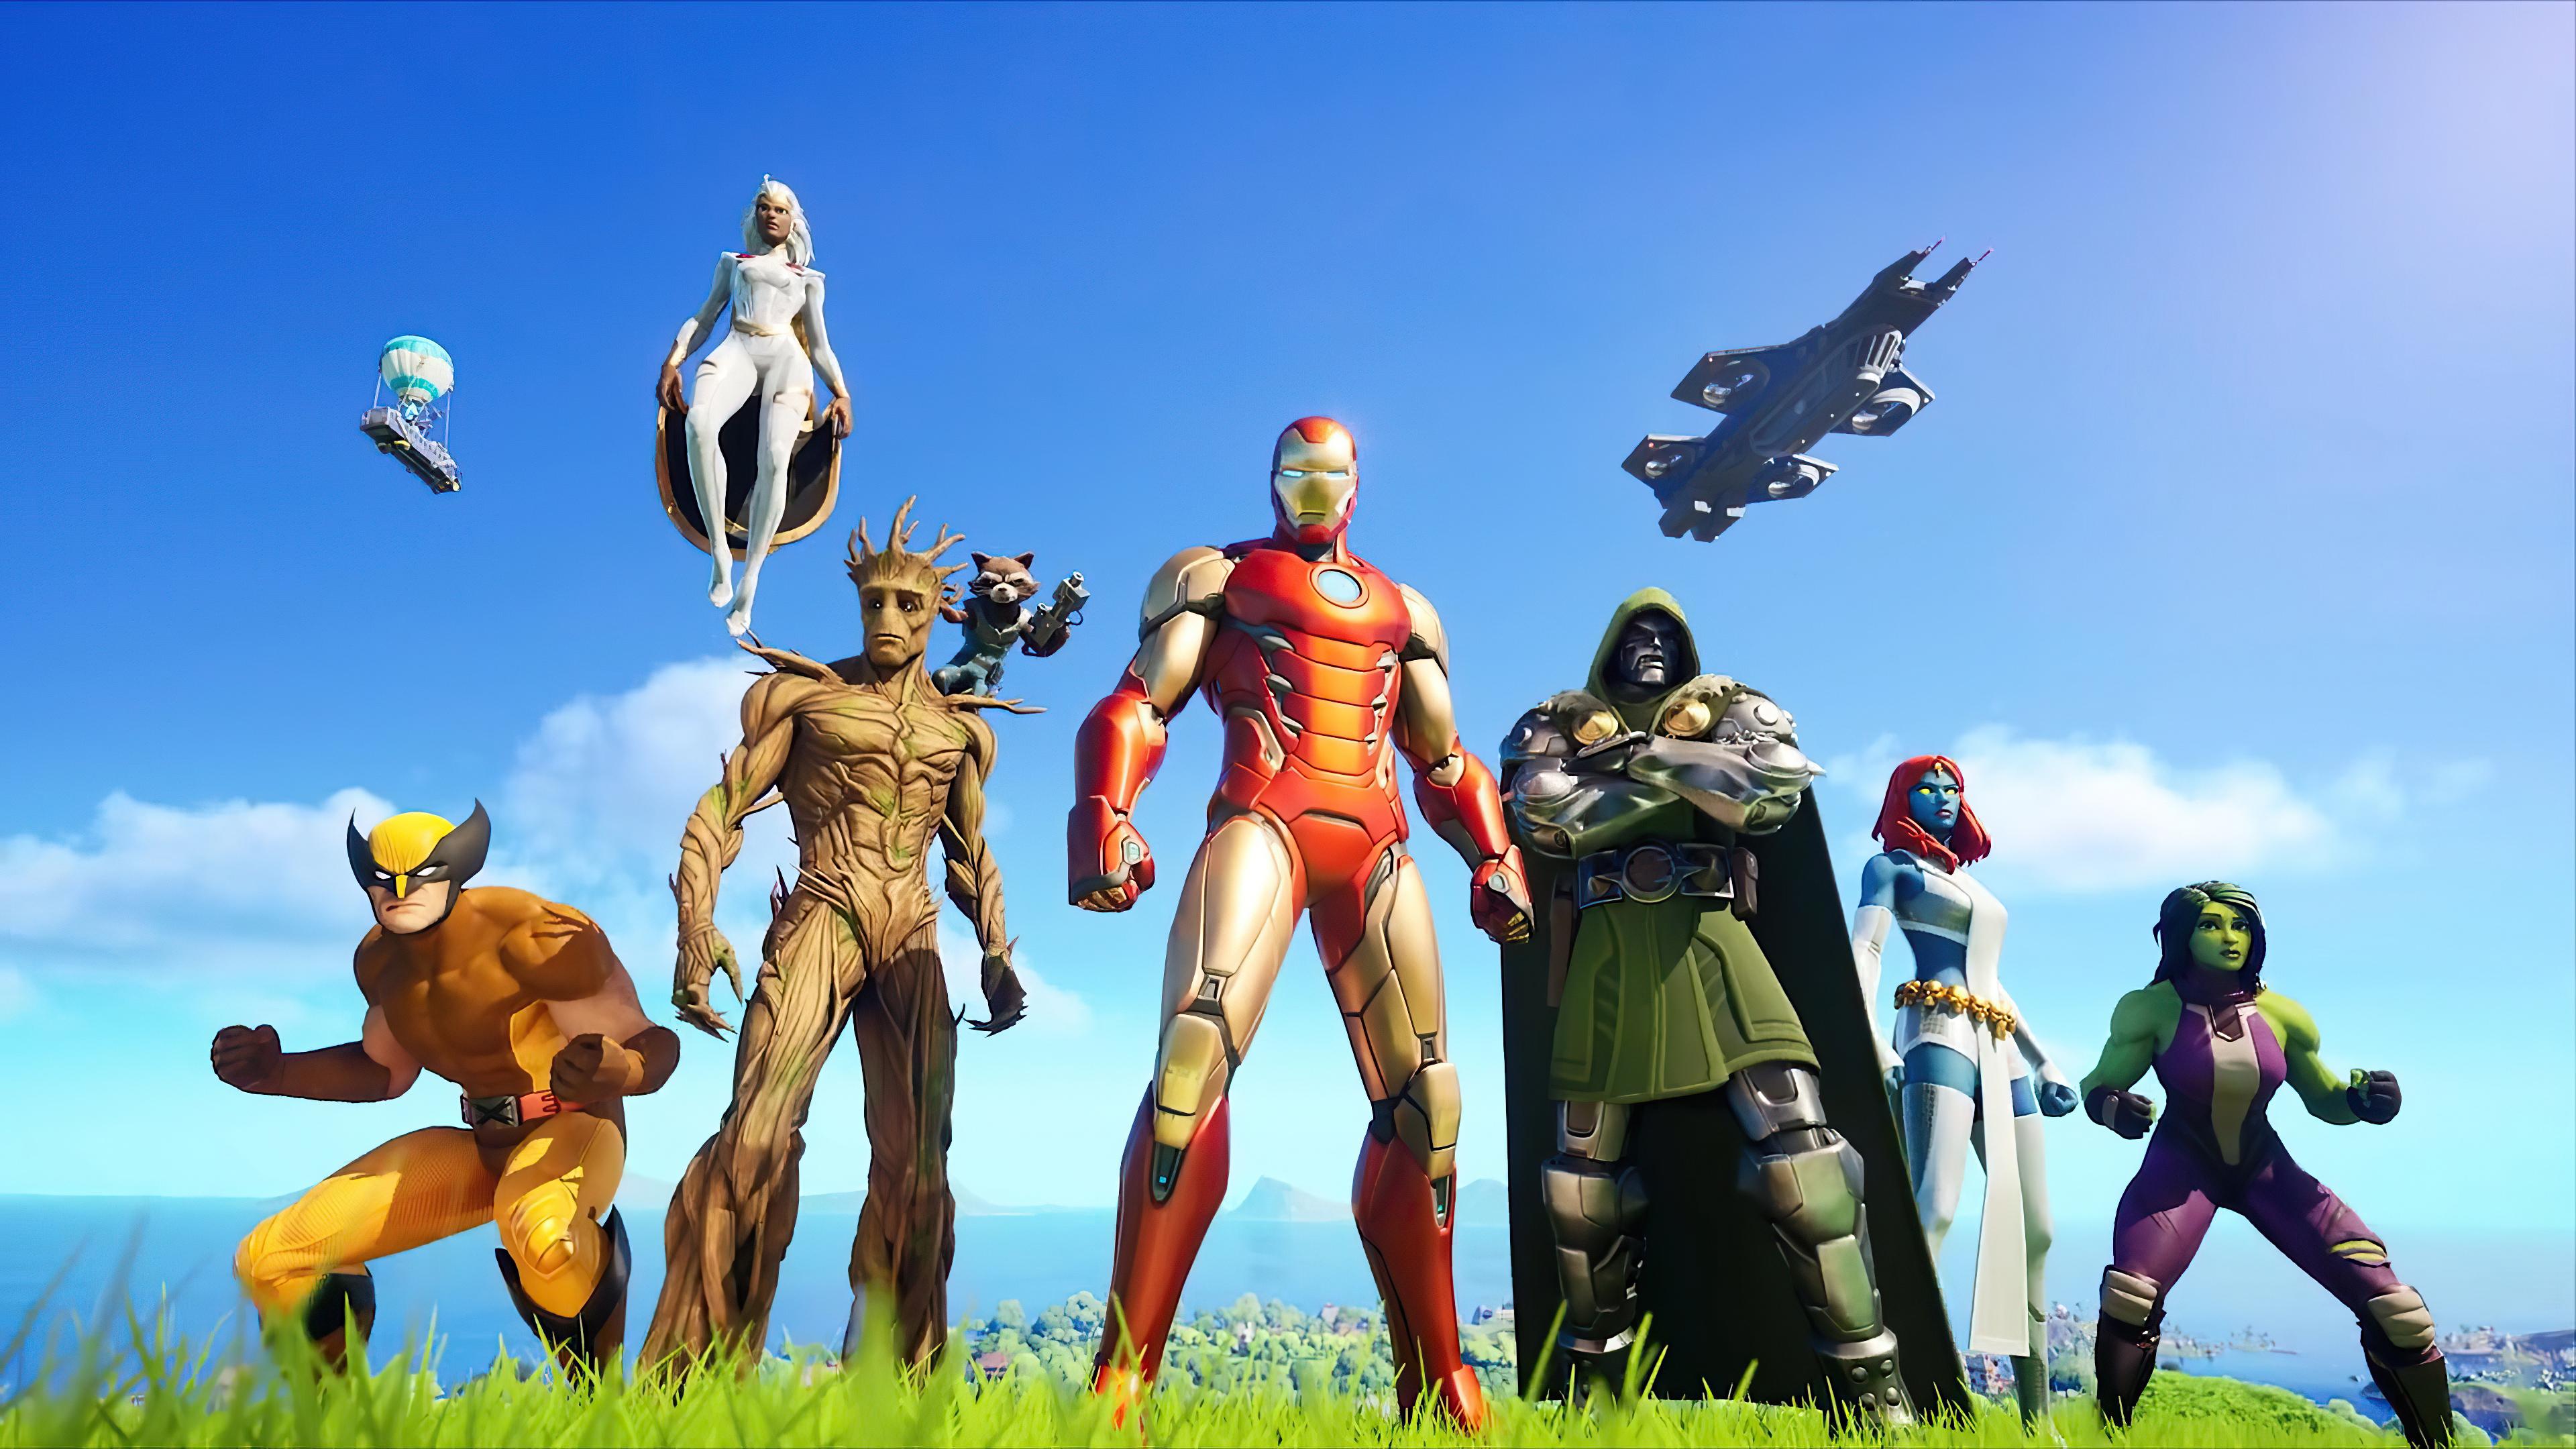 Fortnite Season 4 Nexus War Wallpaper Hd Games 4k Wallpapers Images Photos And Background